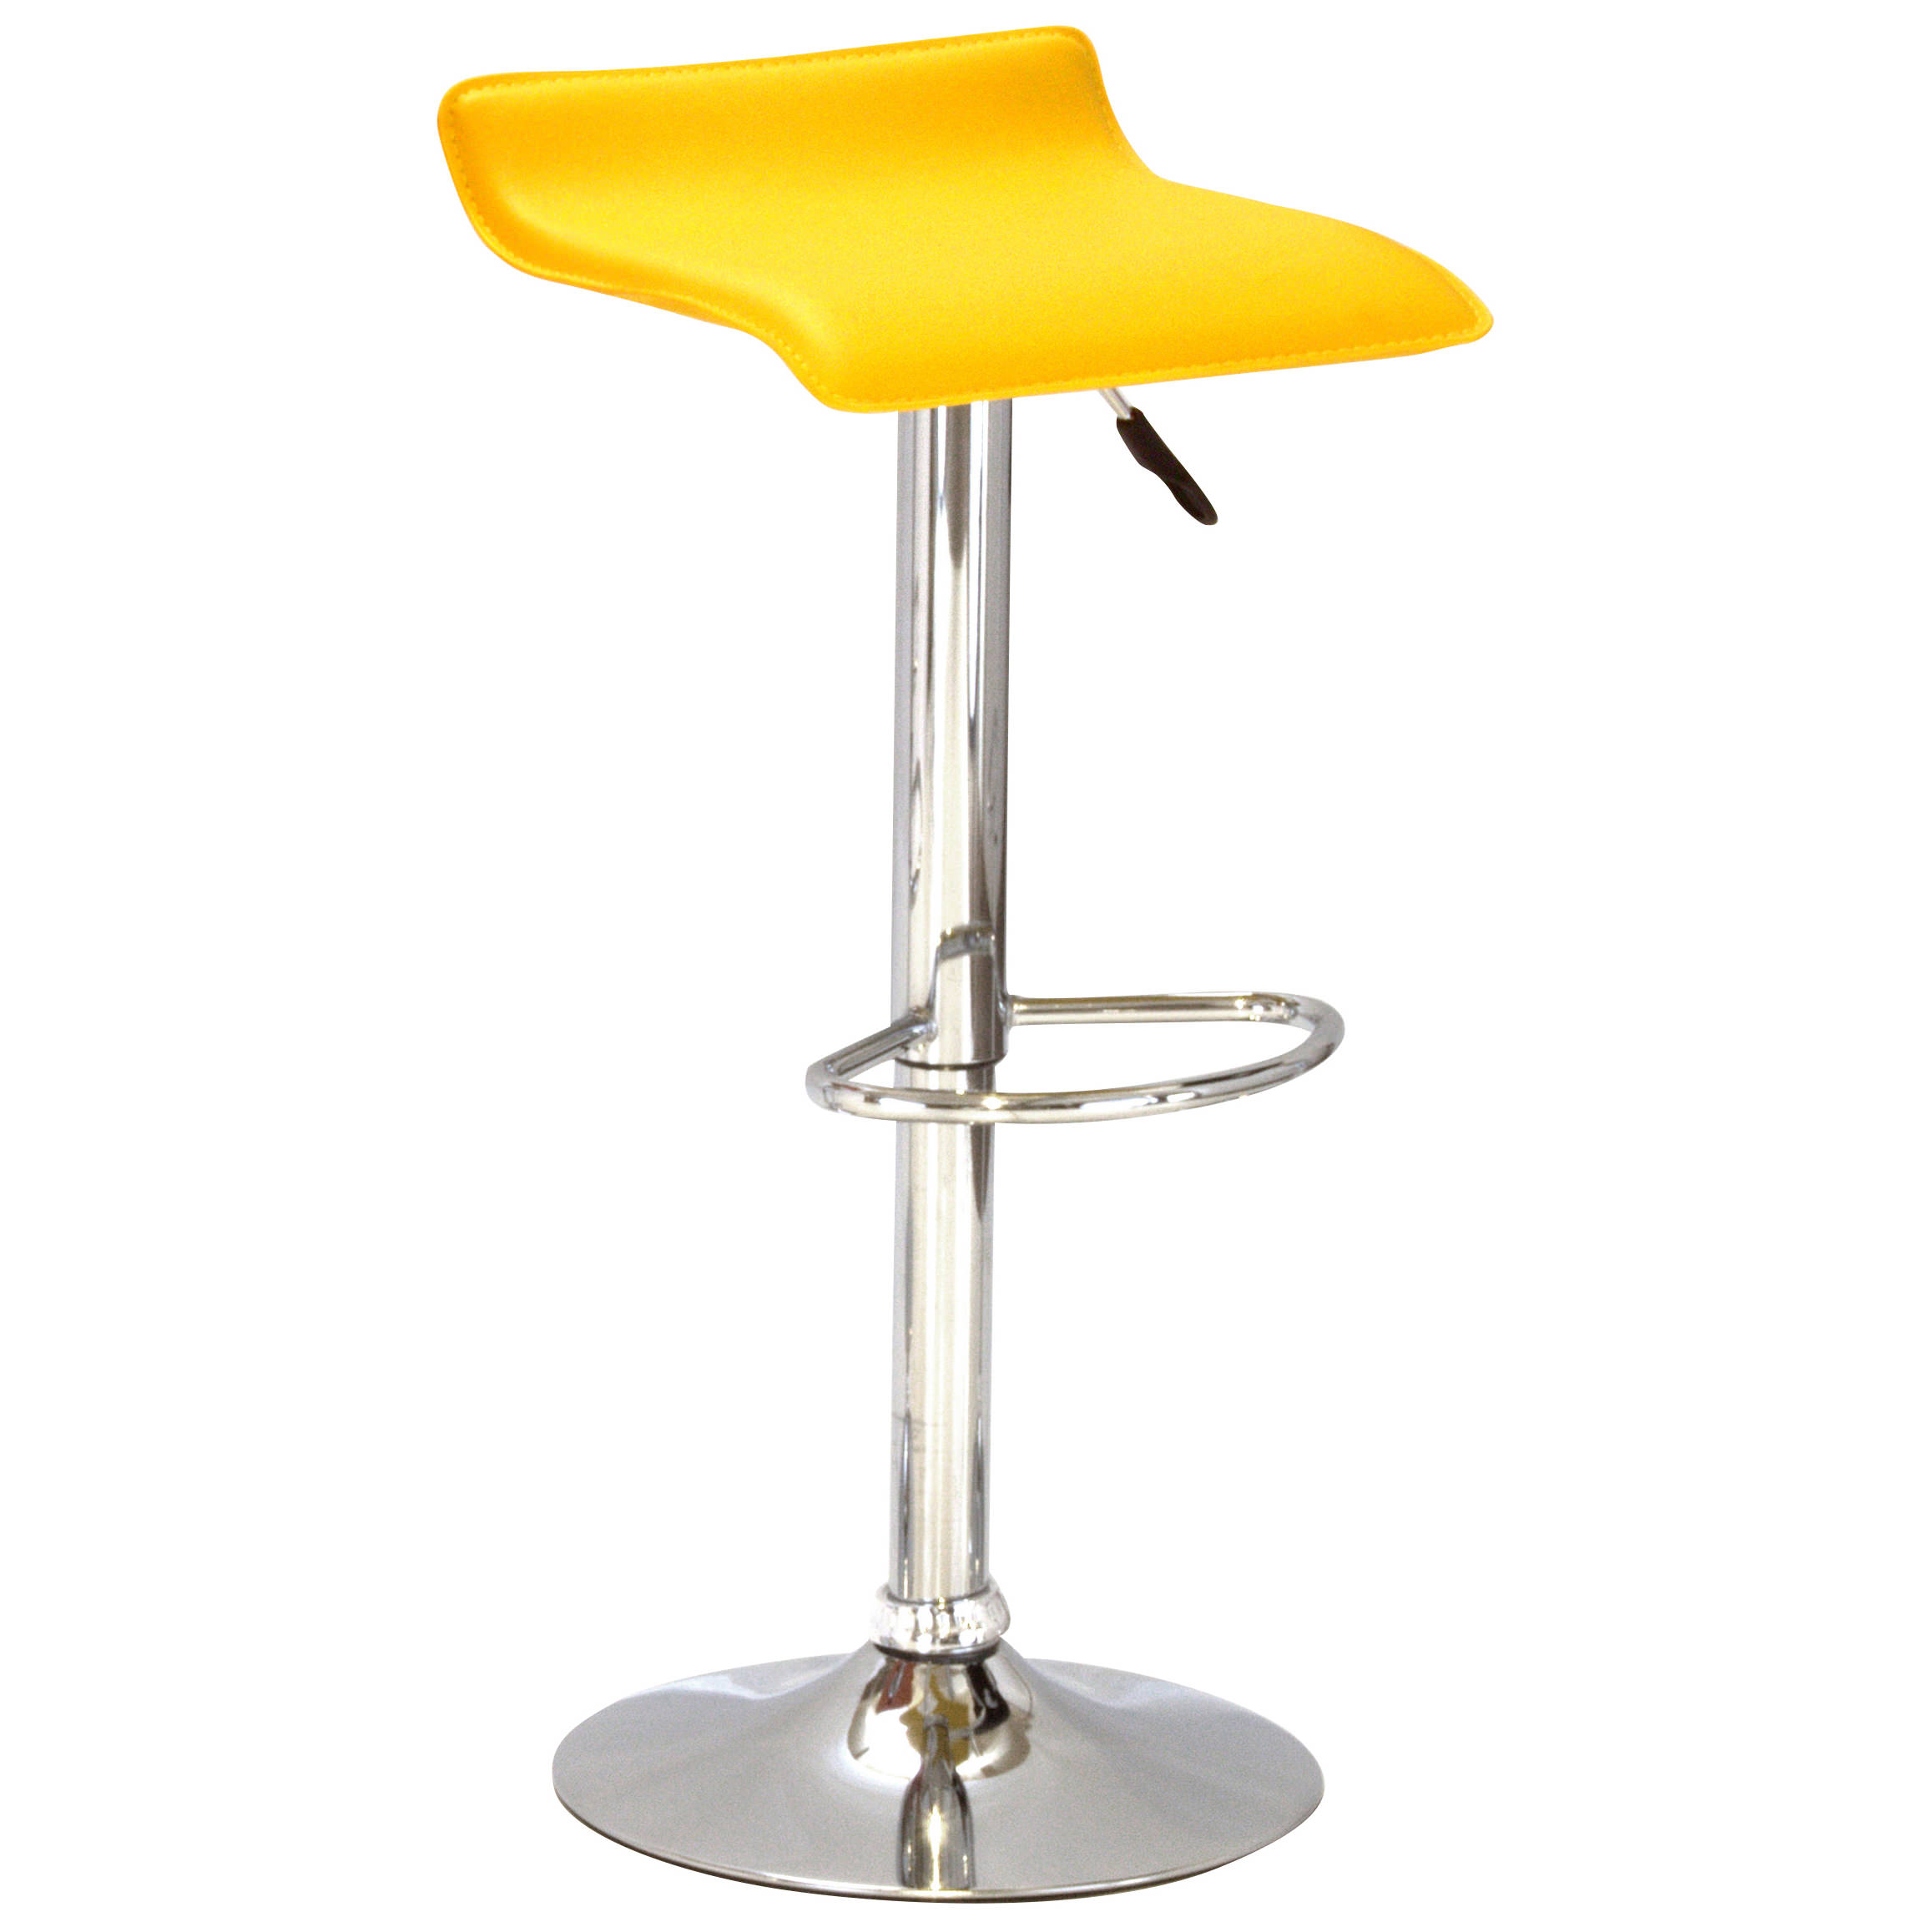 2x Kitchen Breakfast Bar Stool Seat Barstool Black Green  : h1153barstoolchromemodel8yellowx21 from www.ebay.co.uk size 2315 x 2315 jpeg 193kB